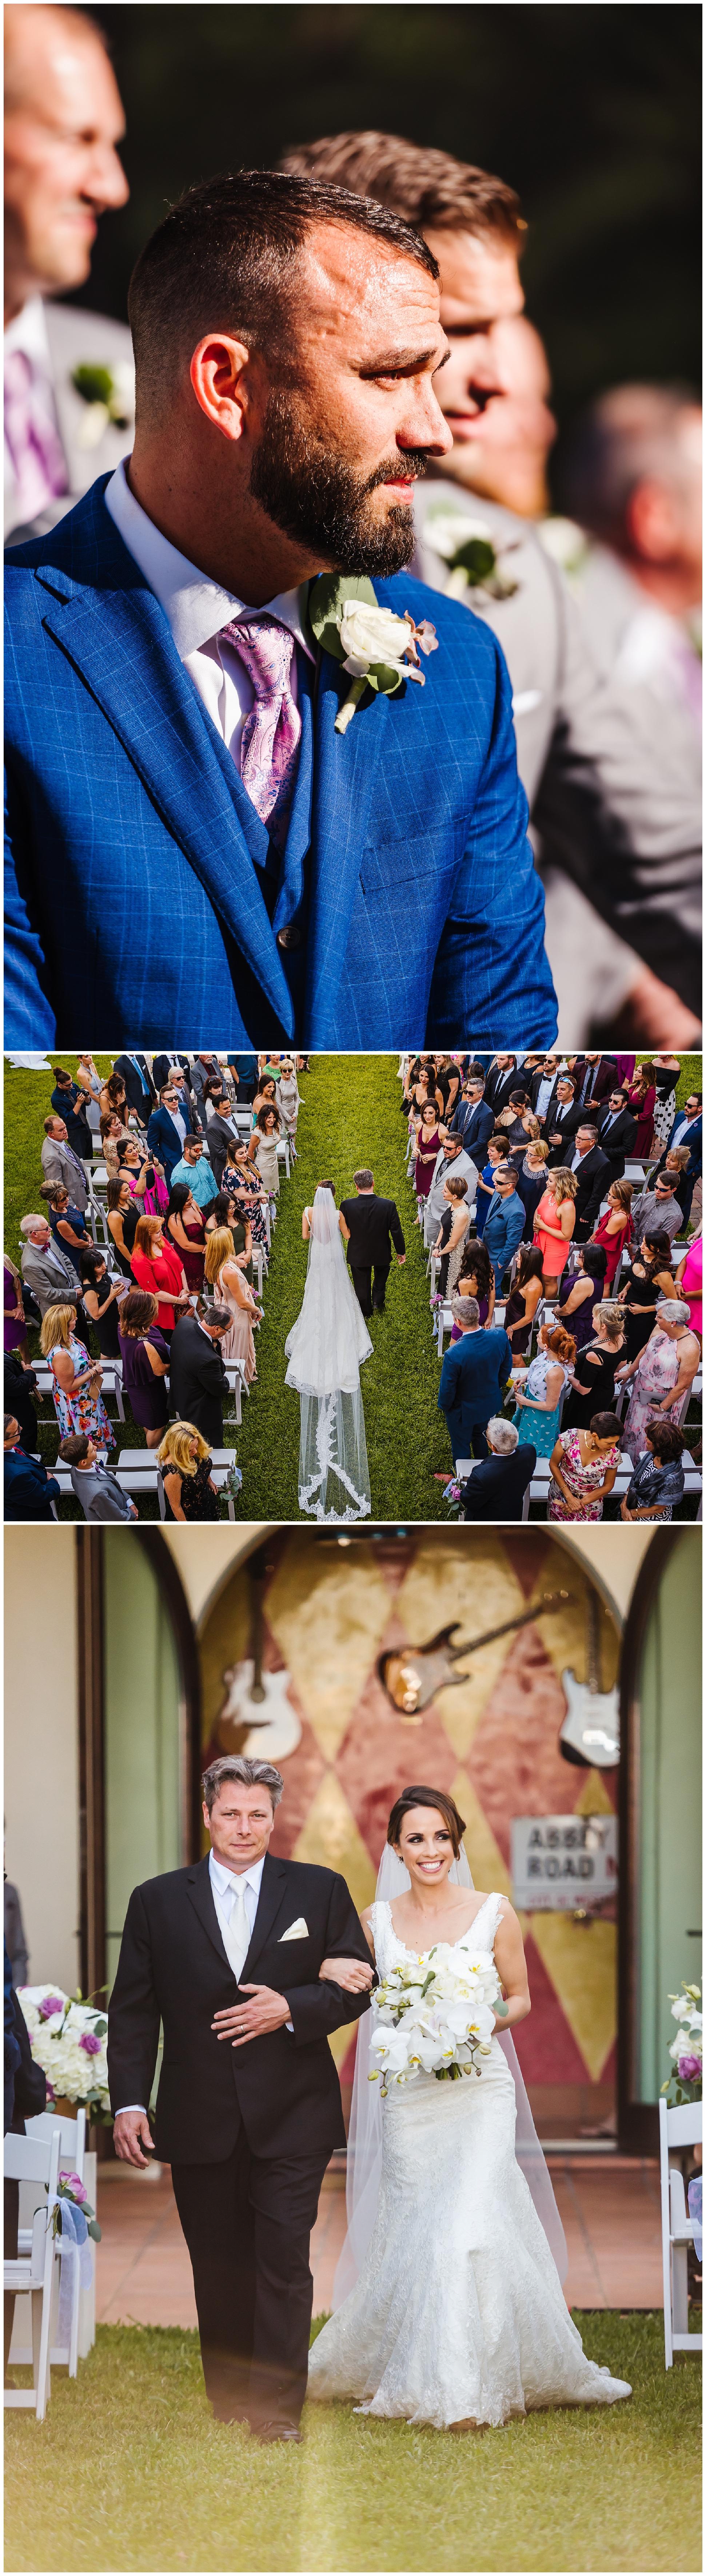 Tampa-luxury-wedding-photographer-mision-lago-private-estate_0026.jpg